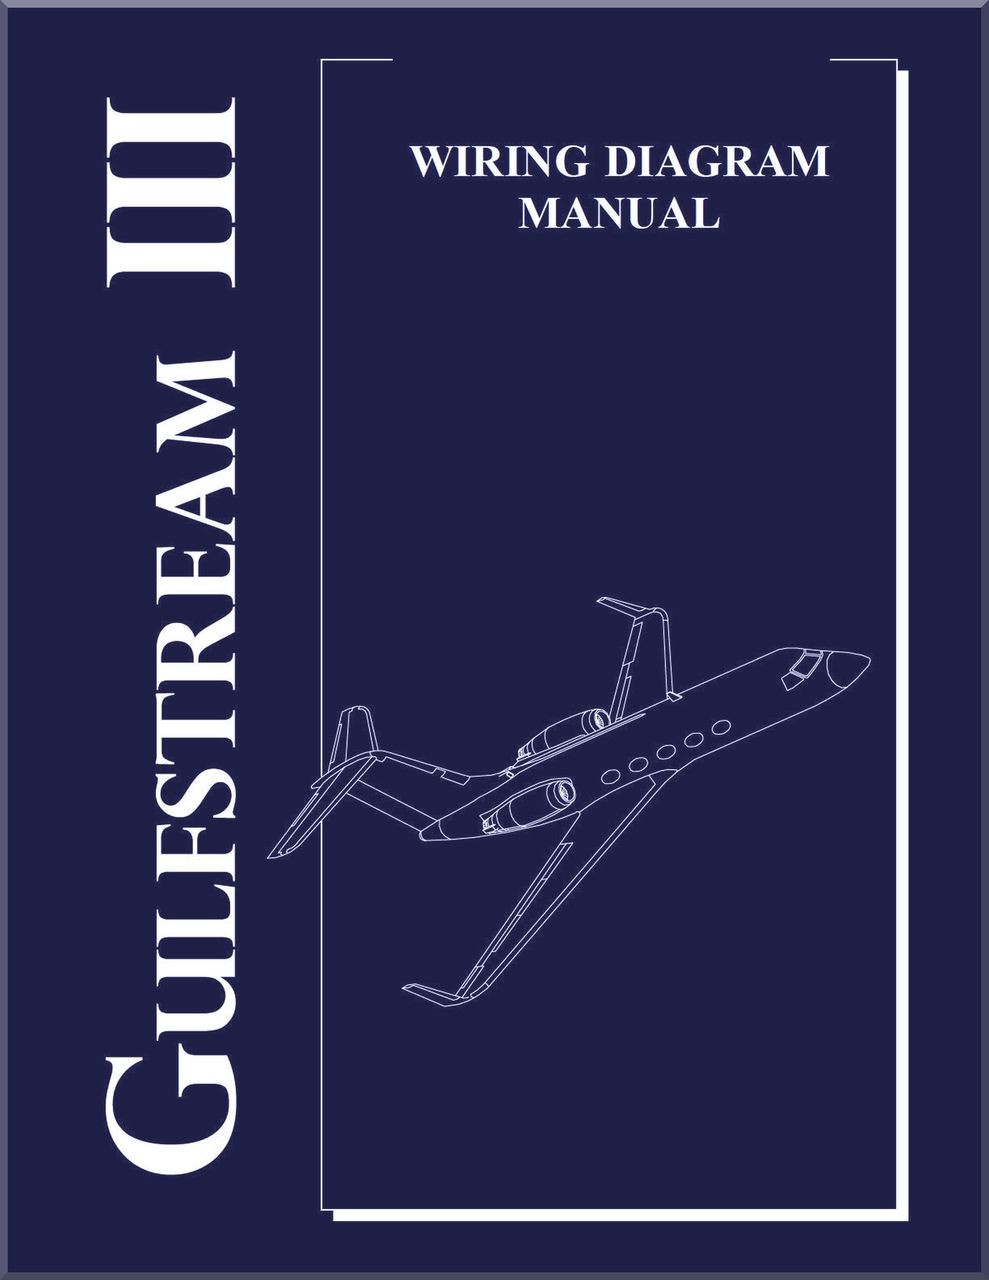 gulfstream iii aircraft wiring diagram manual Gulfstream 550 Interior Layout gulfstream wiring diagram wiring